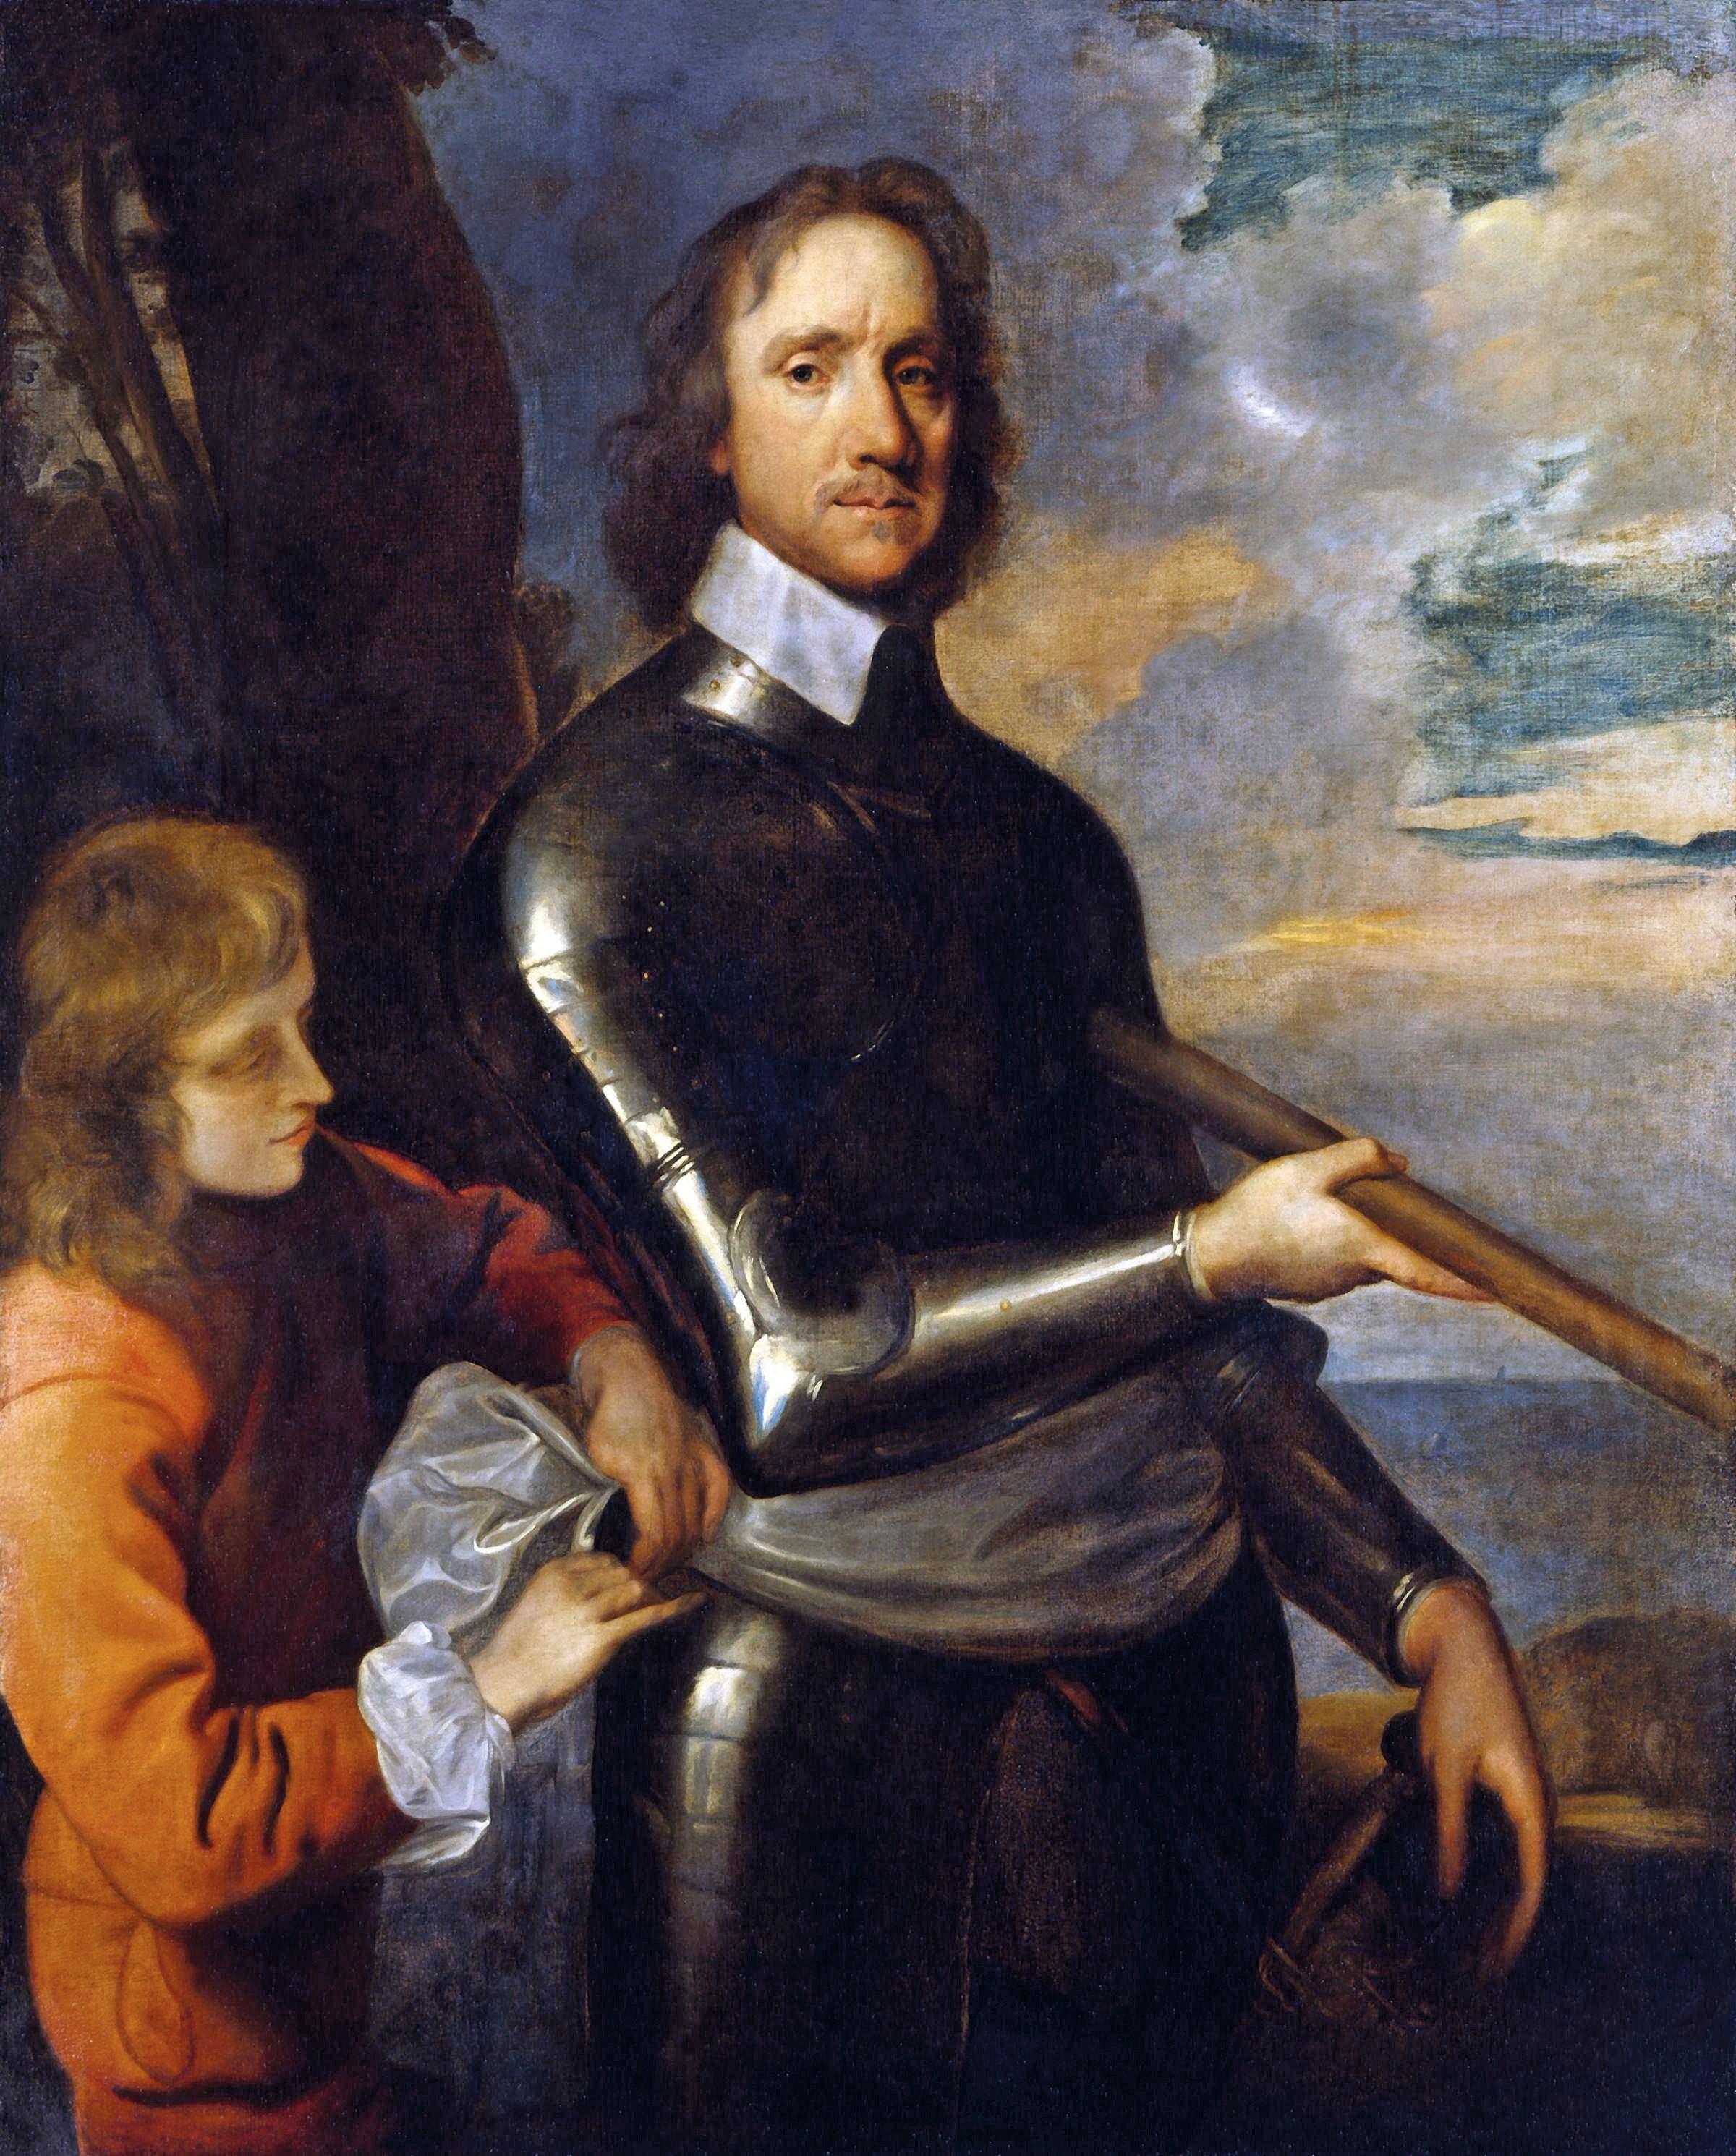 Robert Walker, Oliver Cromwell, v. 1649, huile sur toile, 128 x 103 cm, National Portrait Gallery, Londres